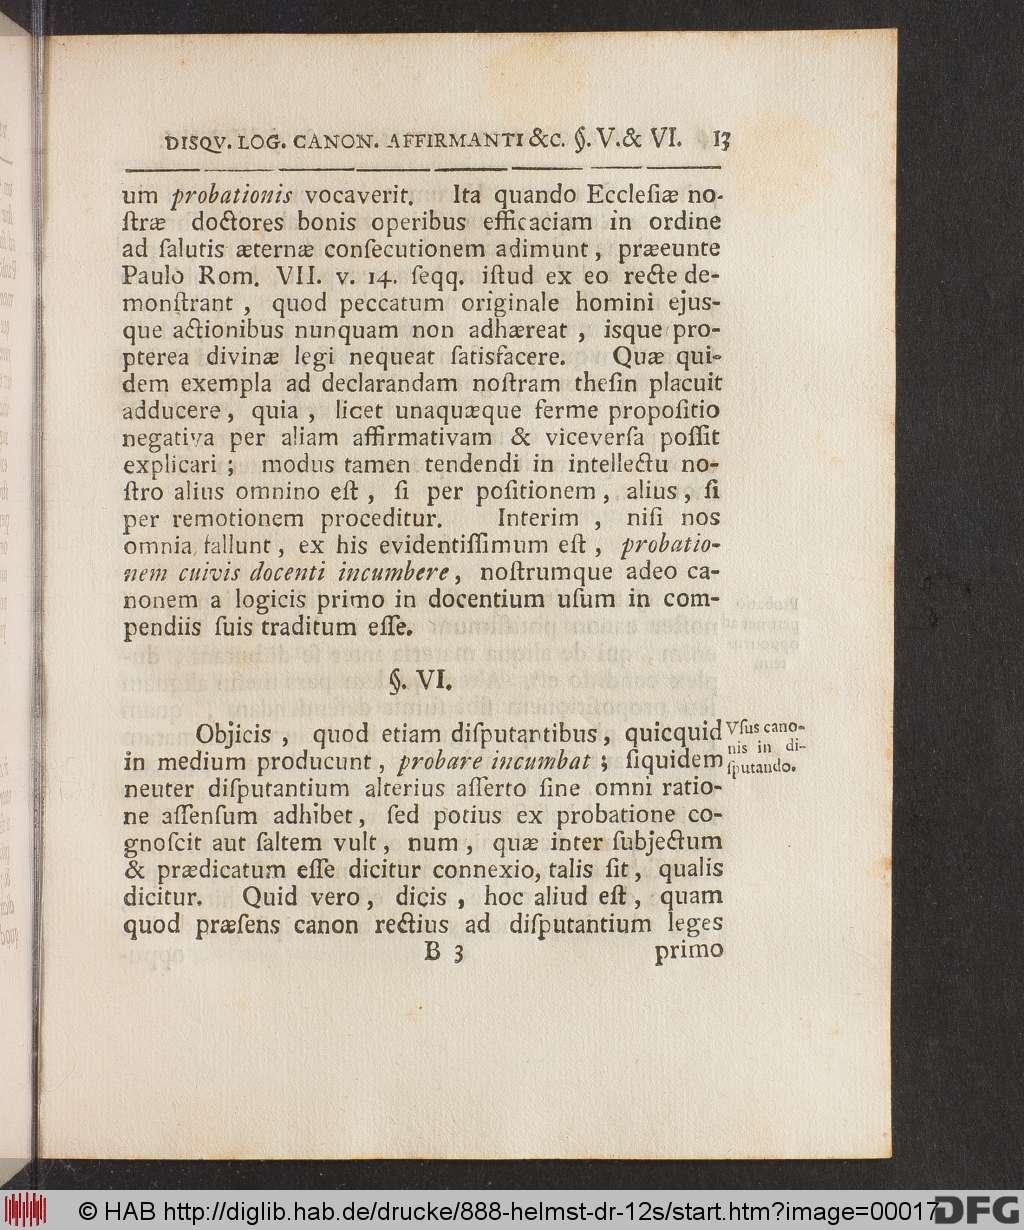 https://diglib.hab.de/drucke/888-helmst-dr-12s/00017.jpg